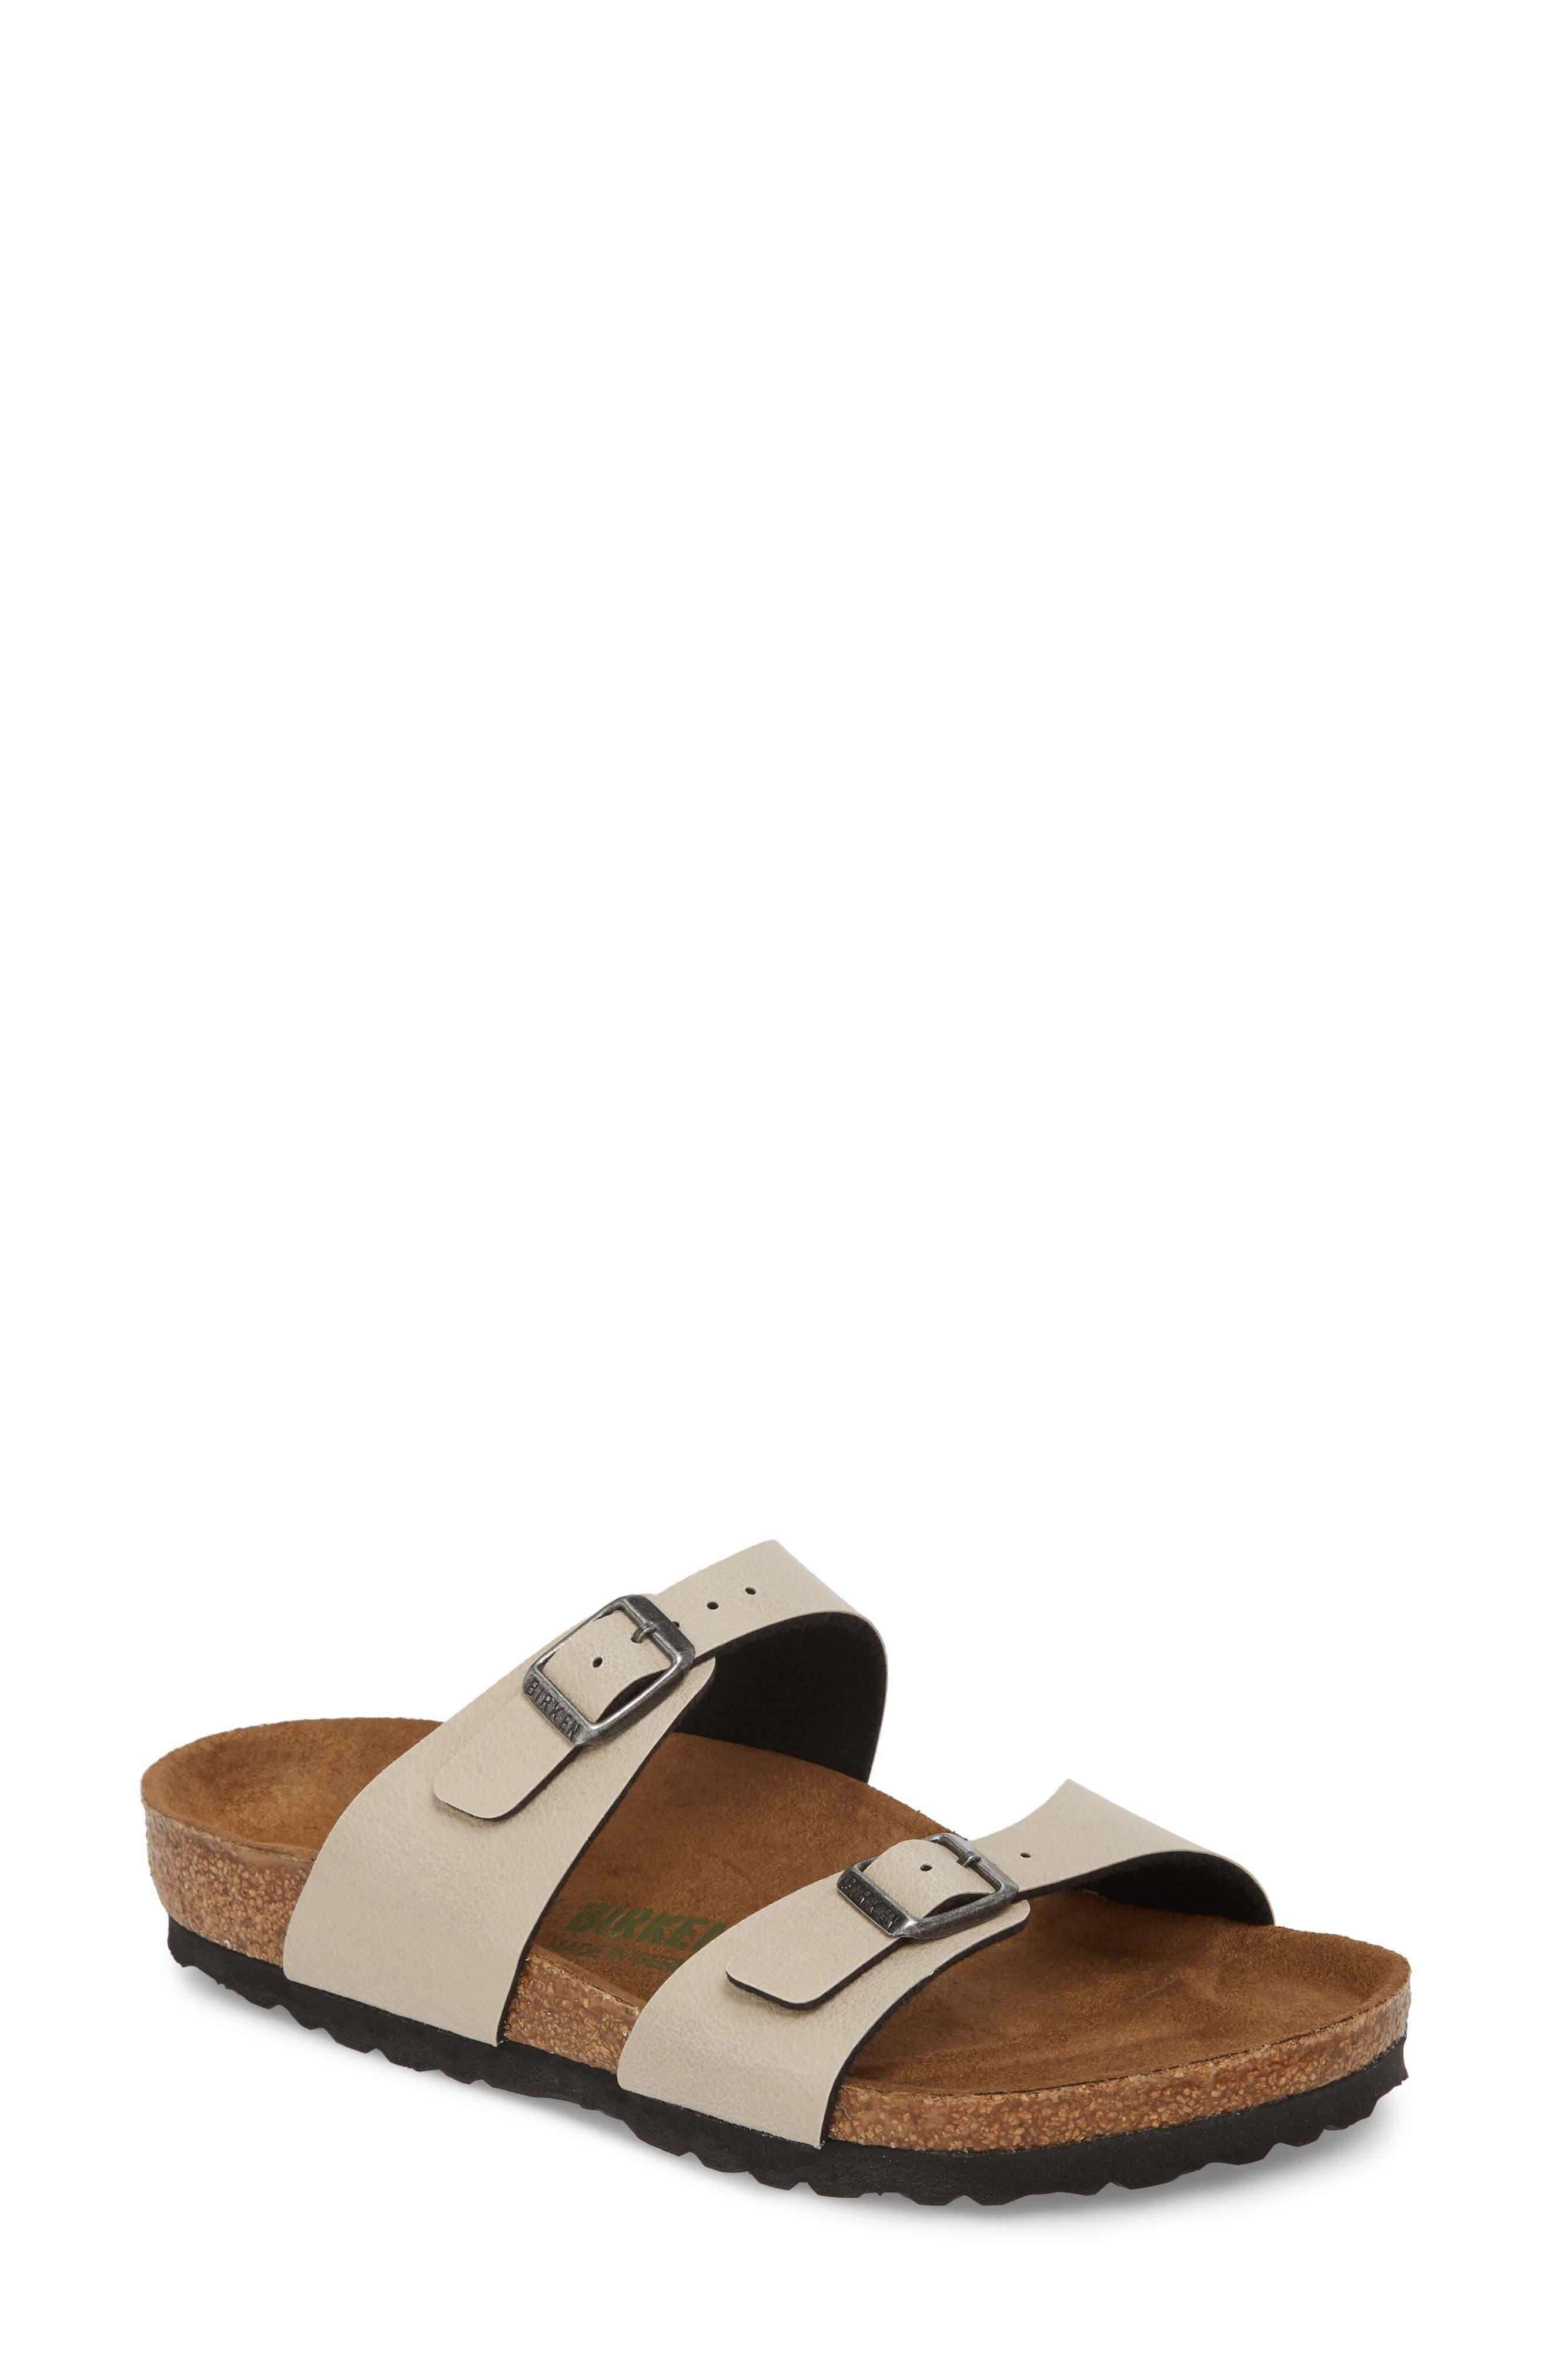 'Sydney' Sandal,                             Main thumbnail 1, color,                             Stone Leather